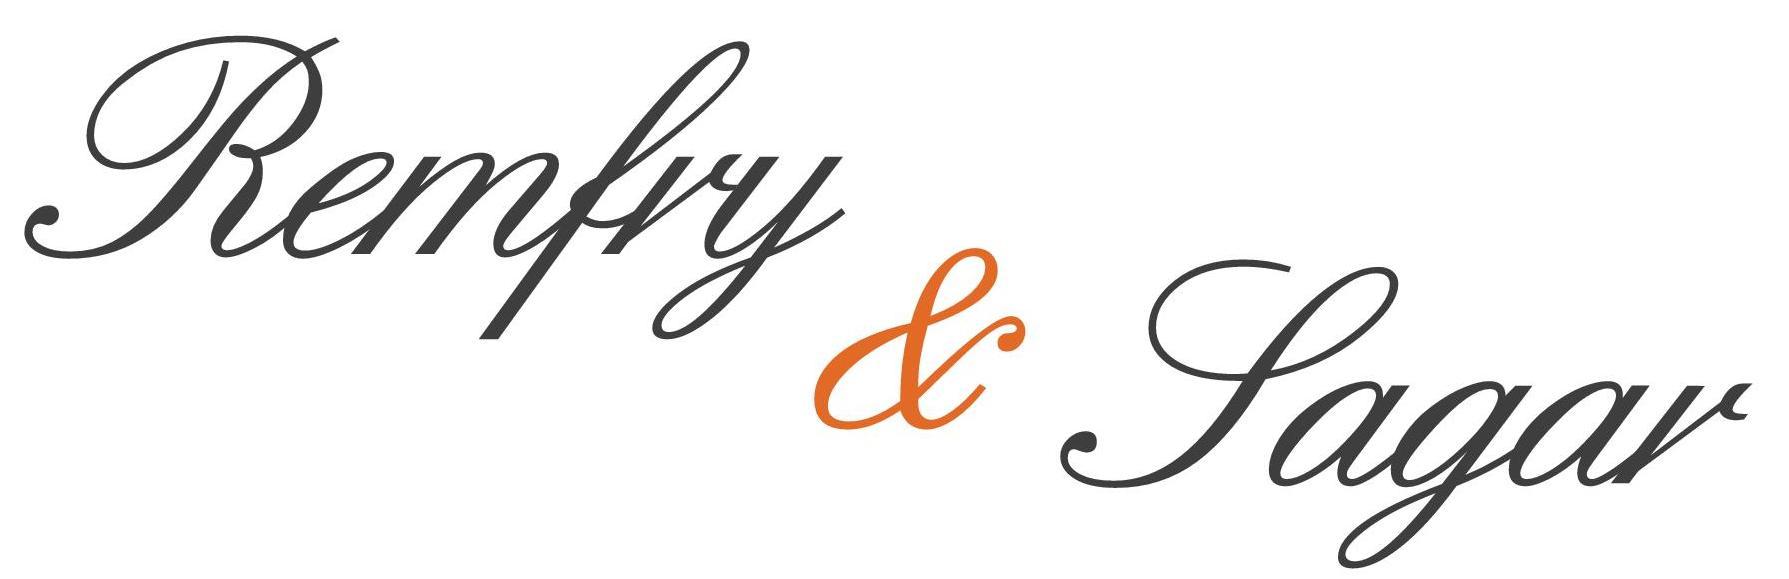 Remfry logo 2019